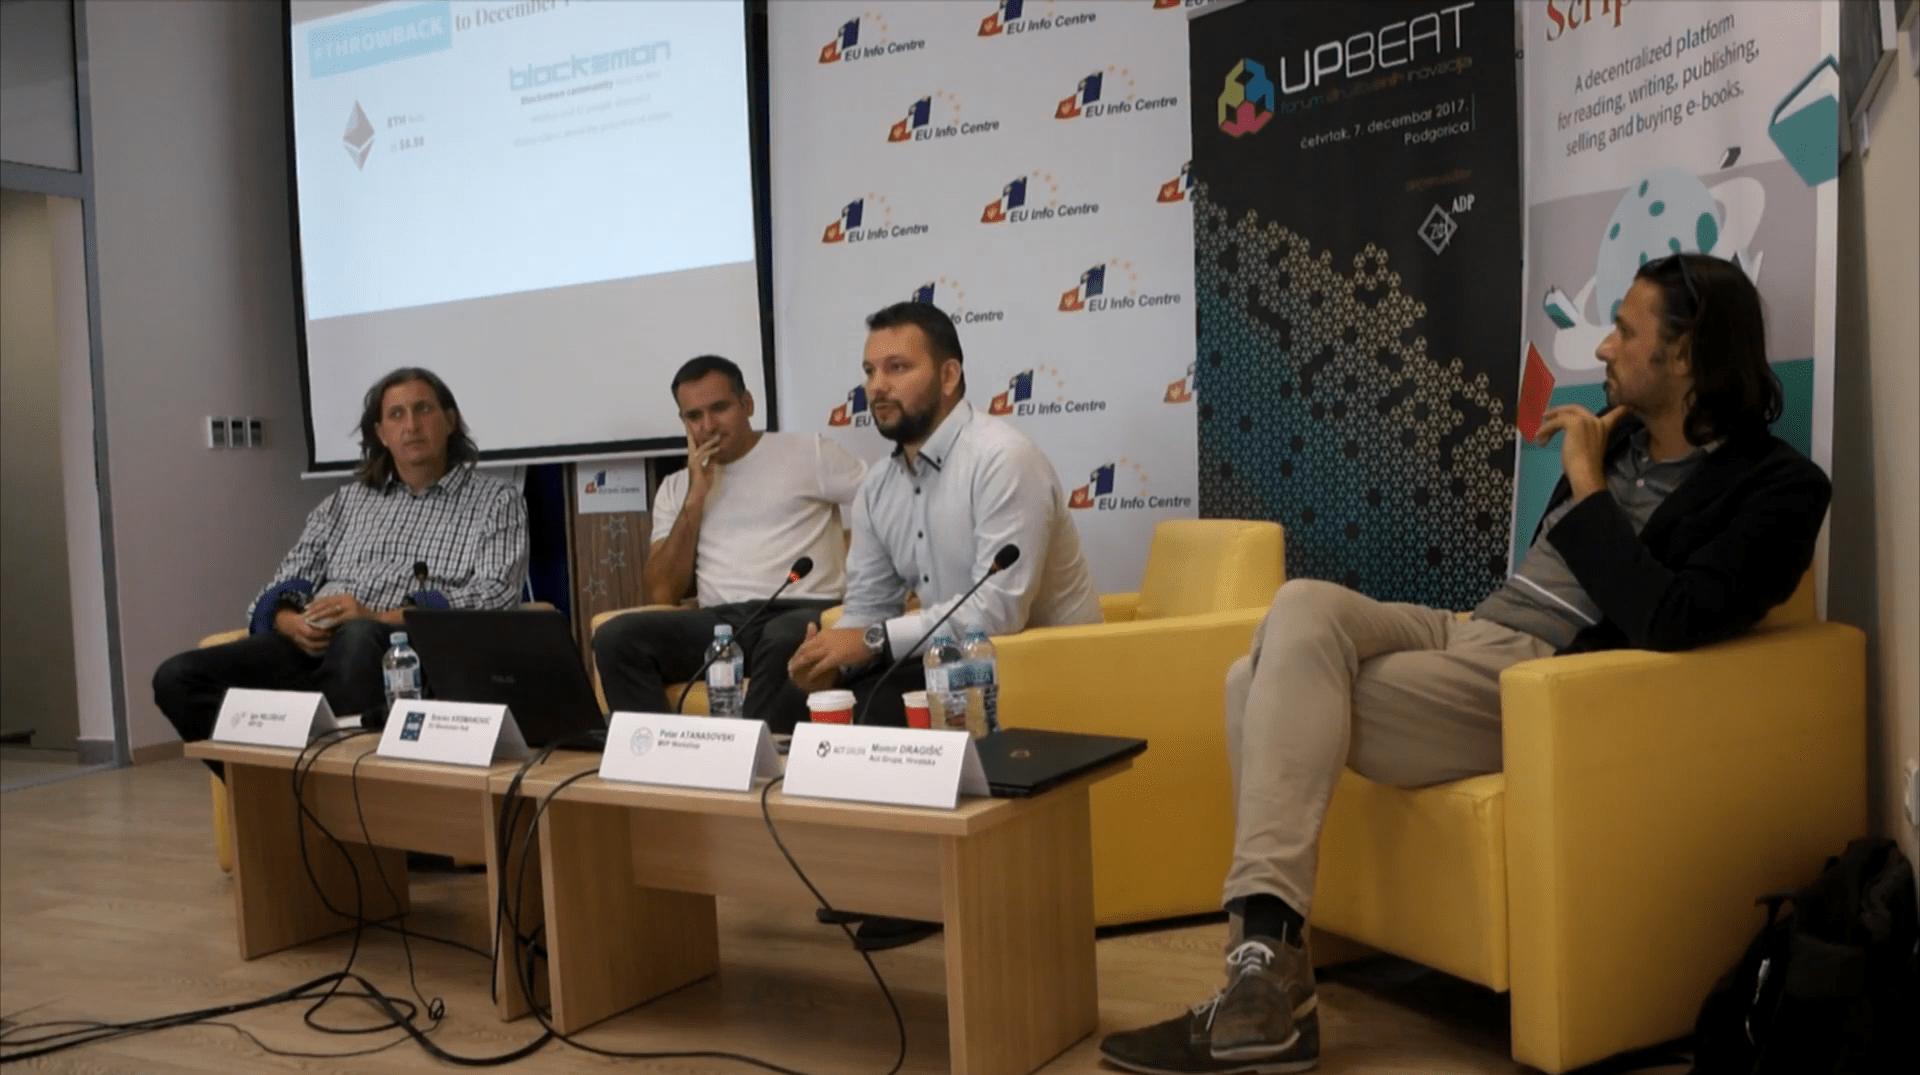 Upbeat Blockchain Meetup